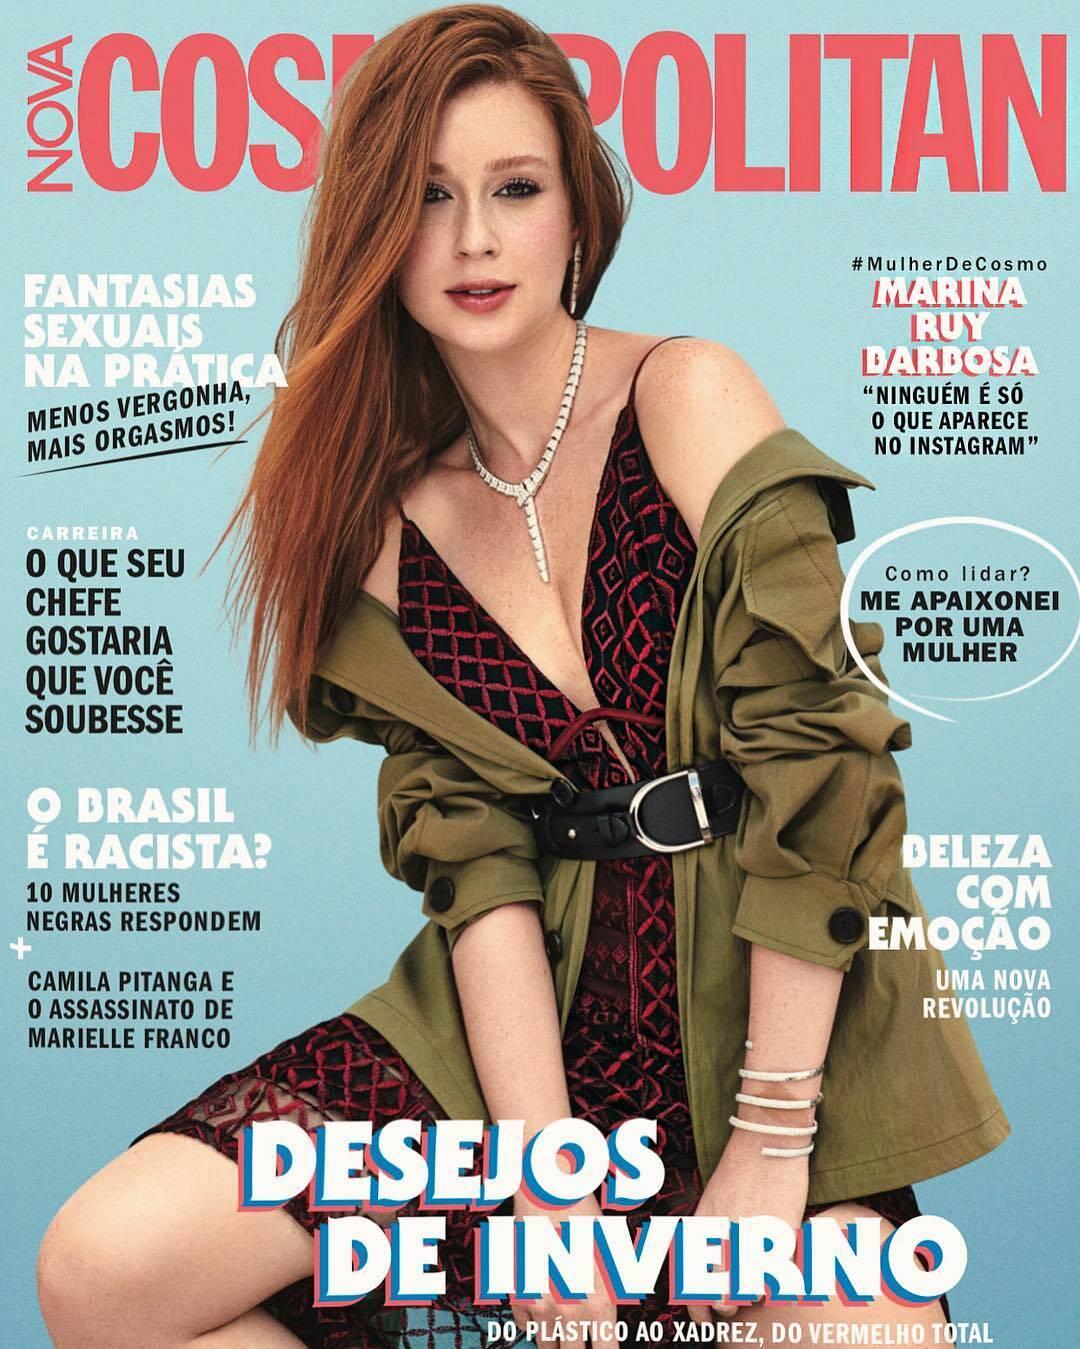 Marina Ruy Barbosa foi capa da revista Cosmopolitan. Foto: Reprodução/Instagram